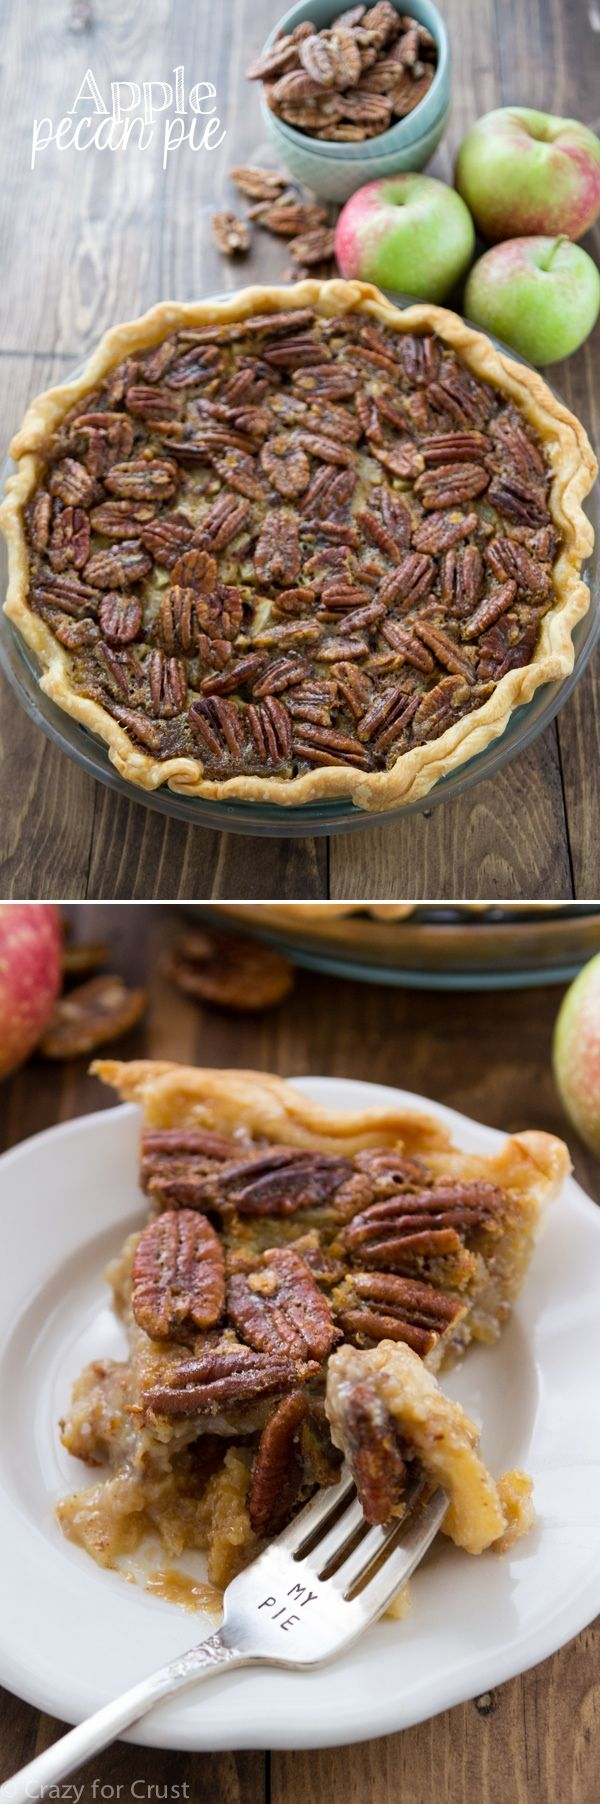 Apple Pecan Pie - Apple Pie and Pecan Pie all in one dessert recipe!